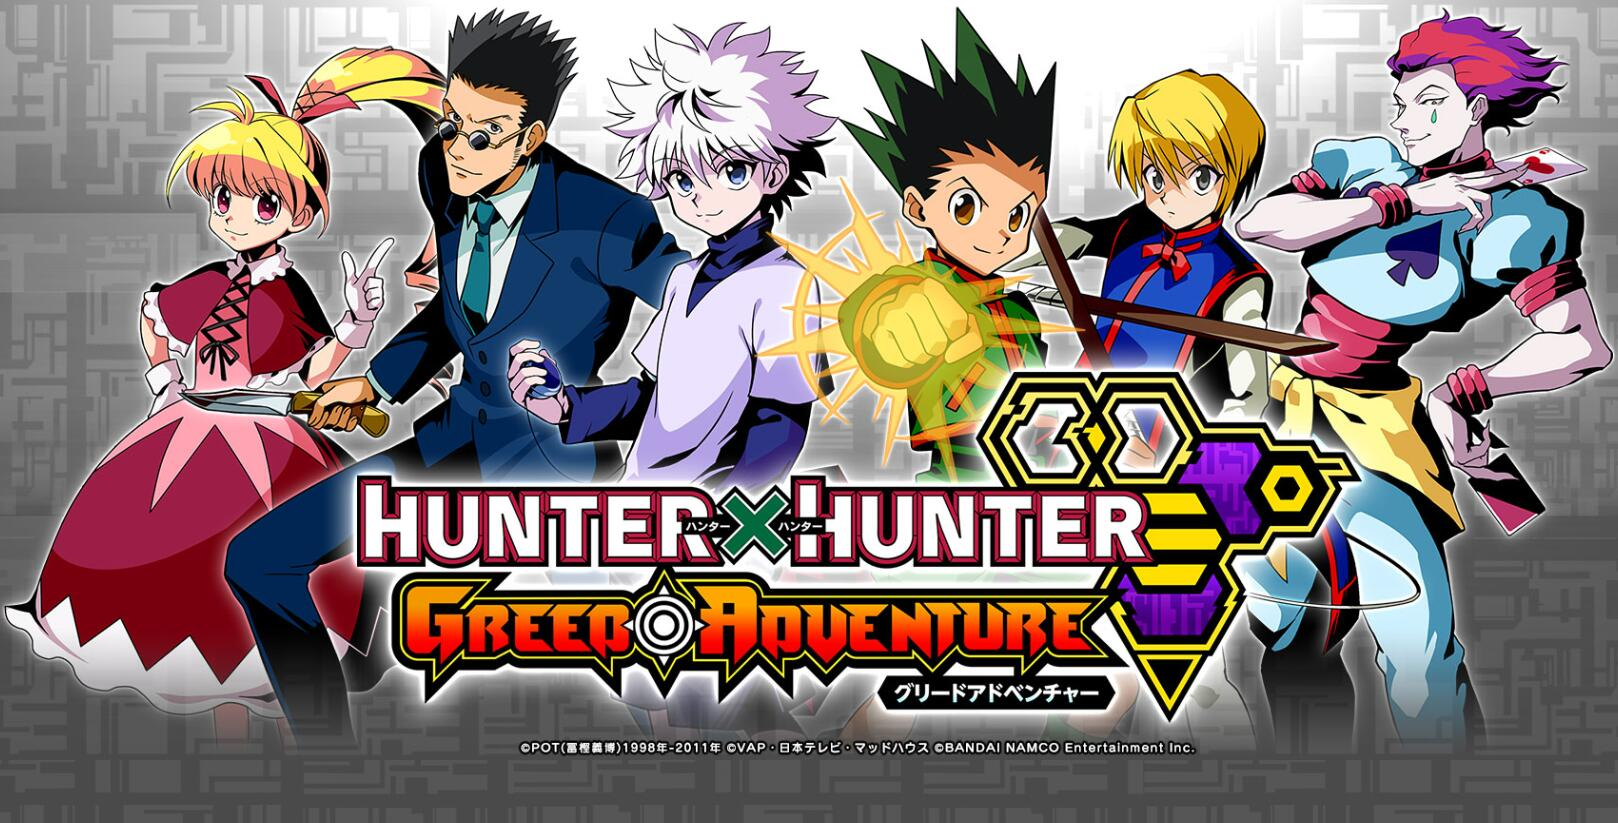 Hunter x Hunter 4122018 4